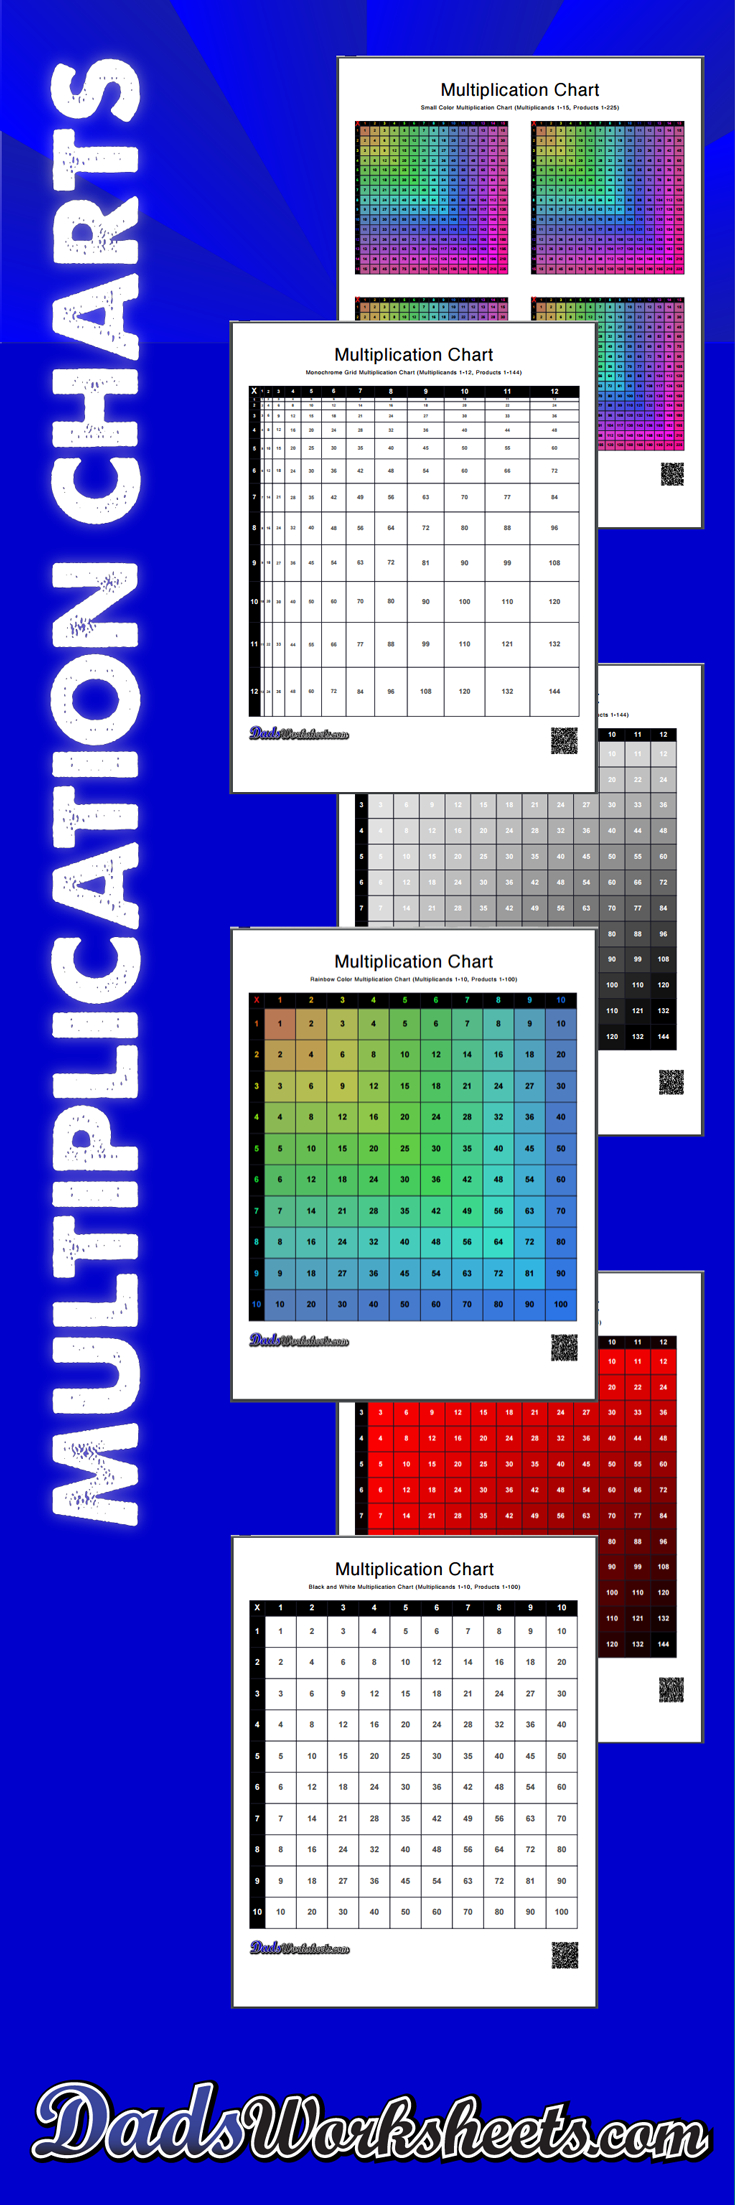 Multiplication Charts: 59 High Resolution Printable Pdfs, 1 pertaining to Printable Multiplication Table 50X50